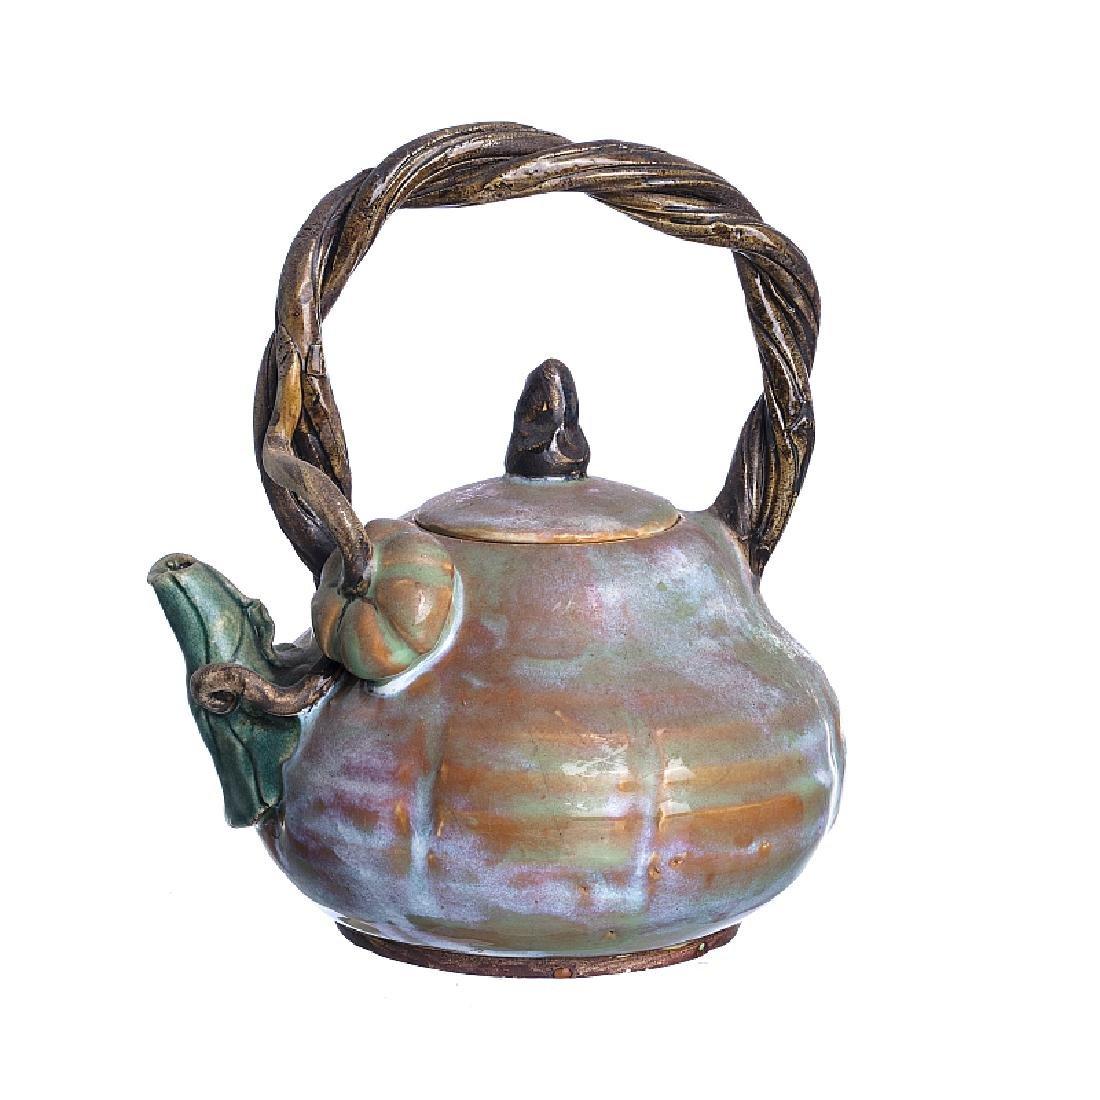 Chinese ceramic Sichuan teapot